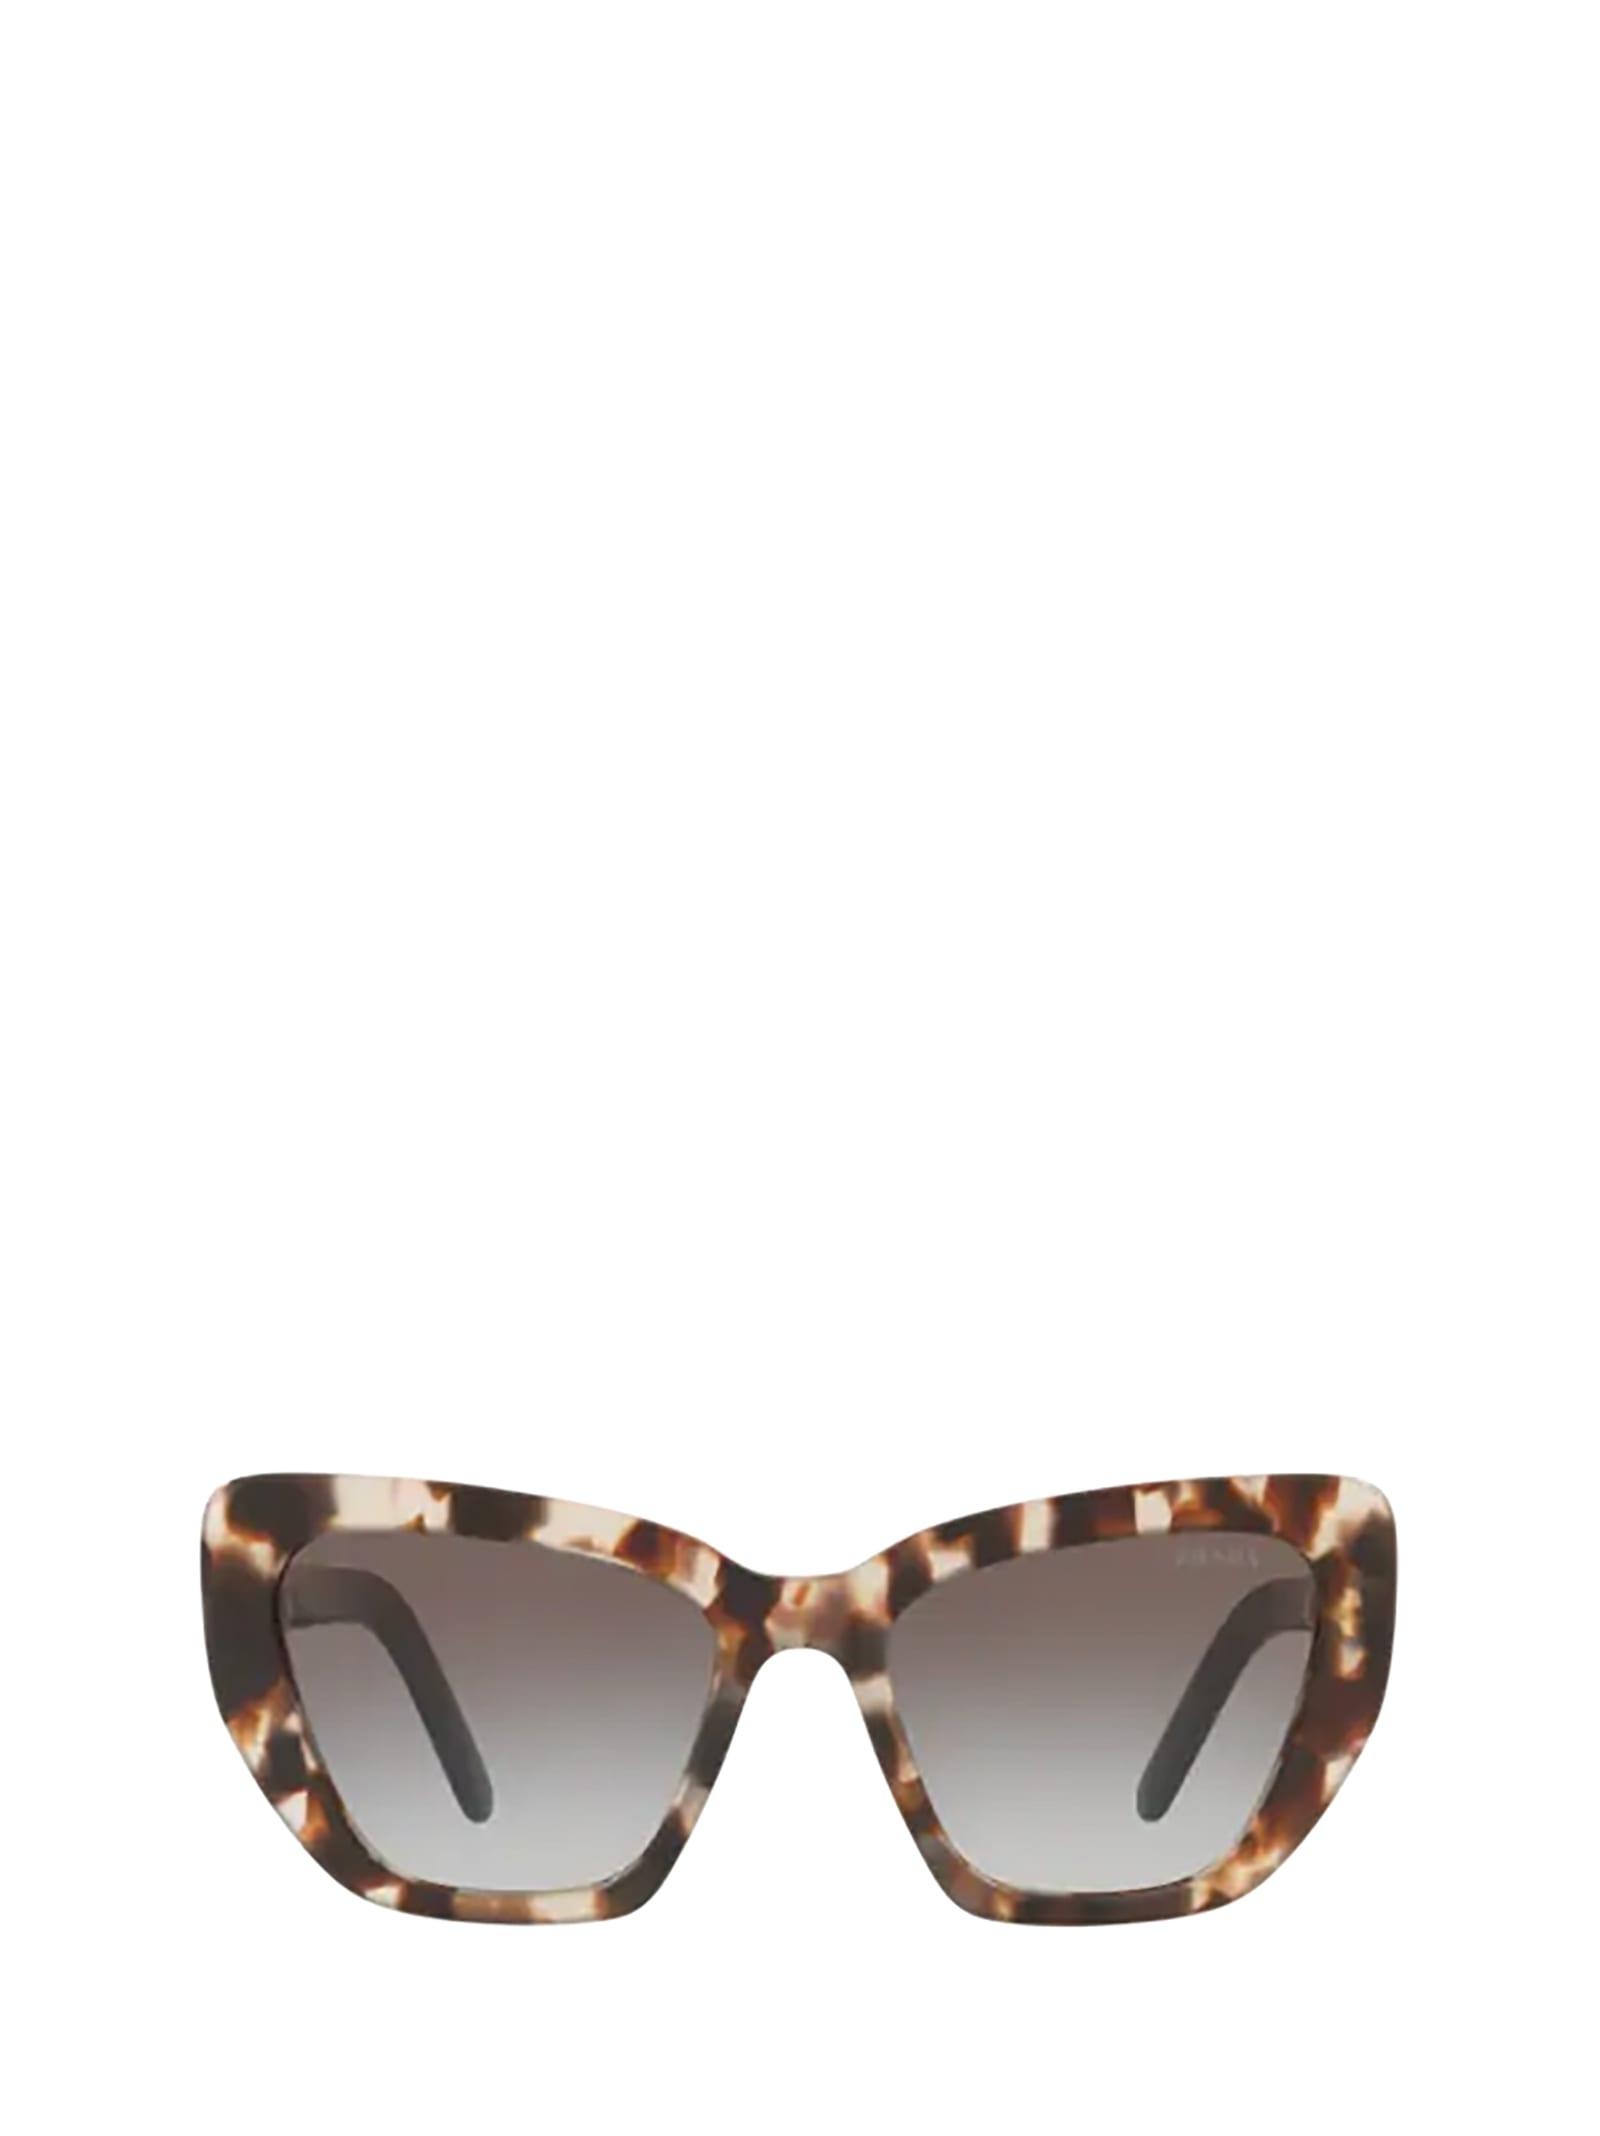 Prada Prada Pr 08vs Spotten Brown Sunglasses